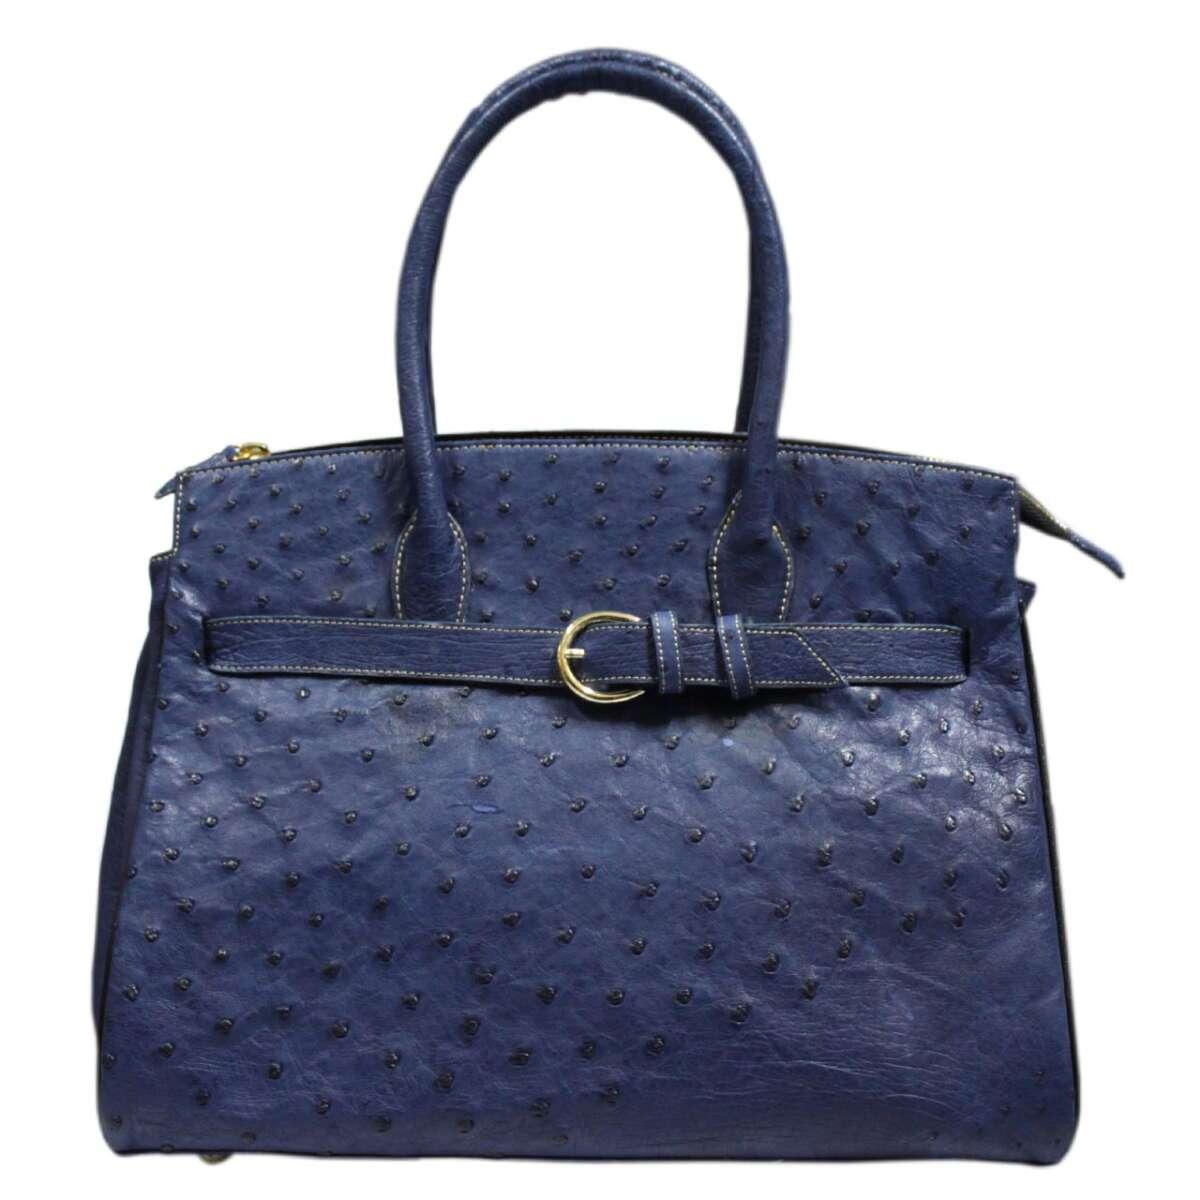 Ostrich leather handbag E007d